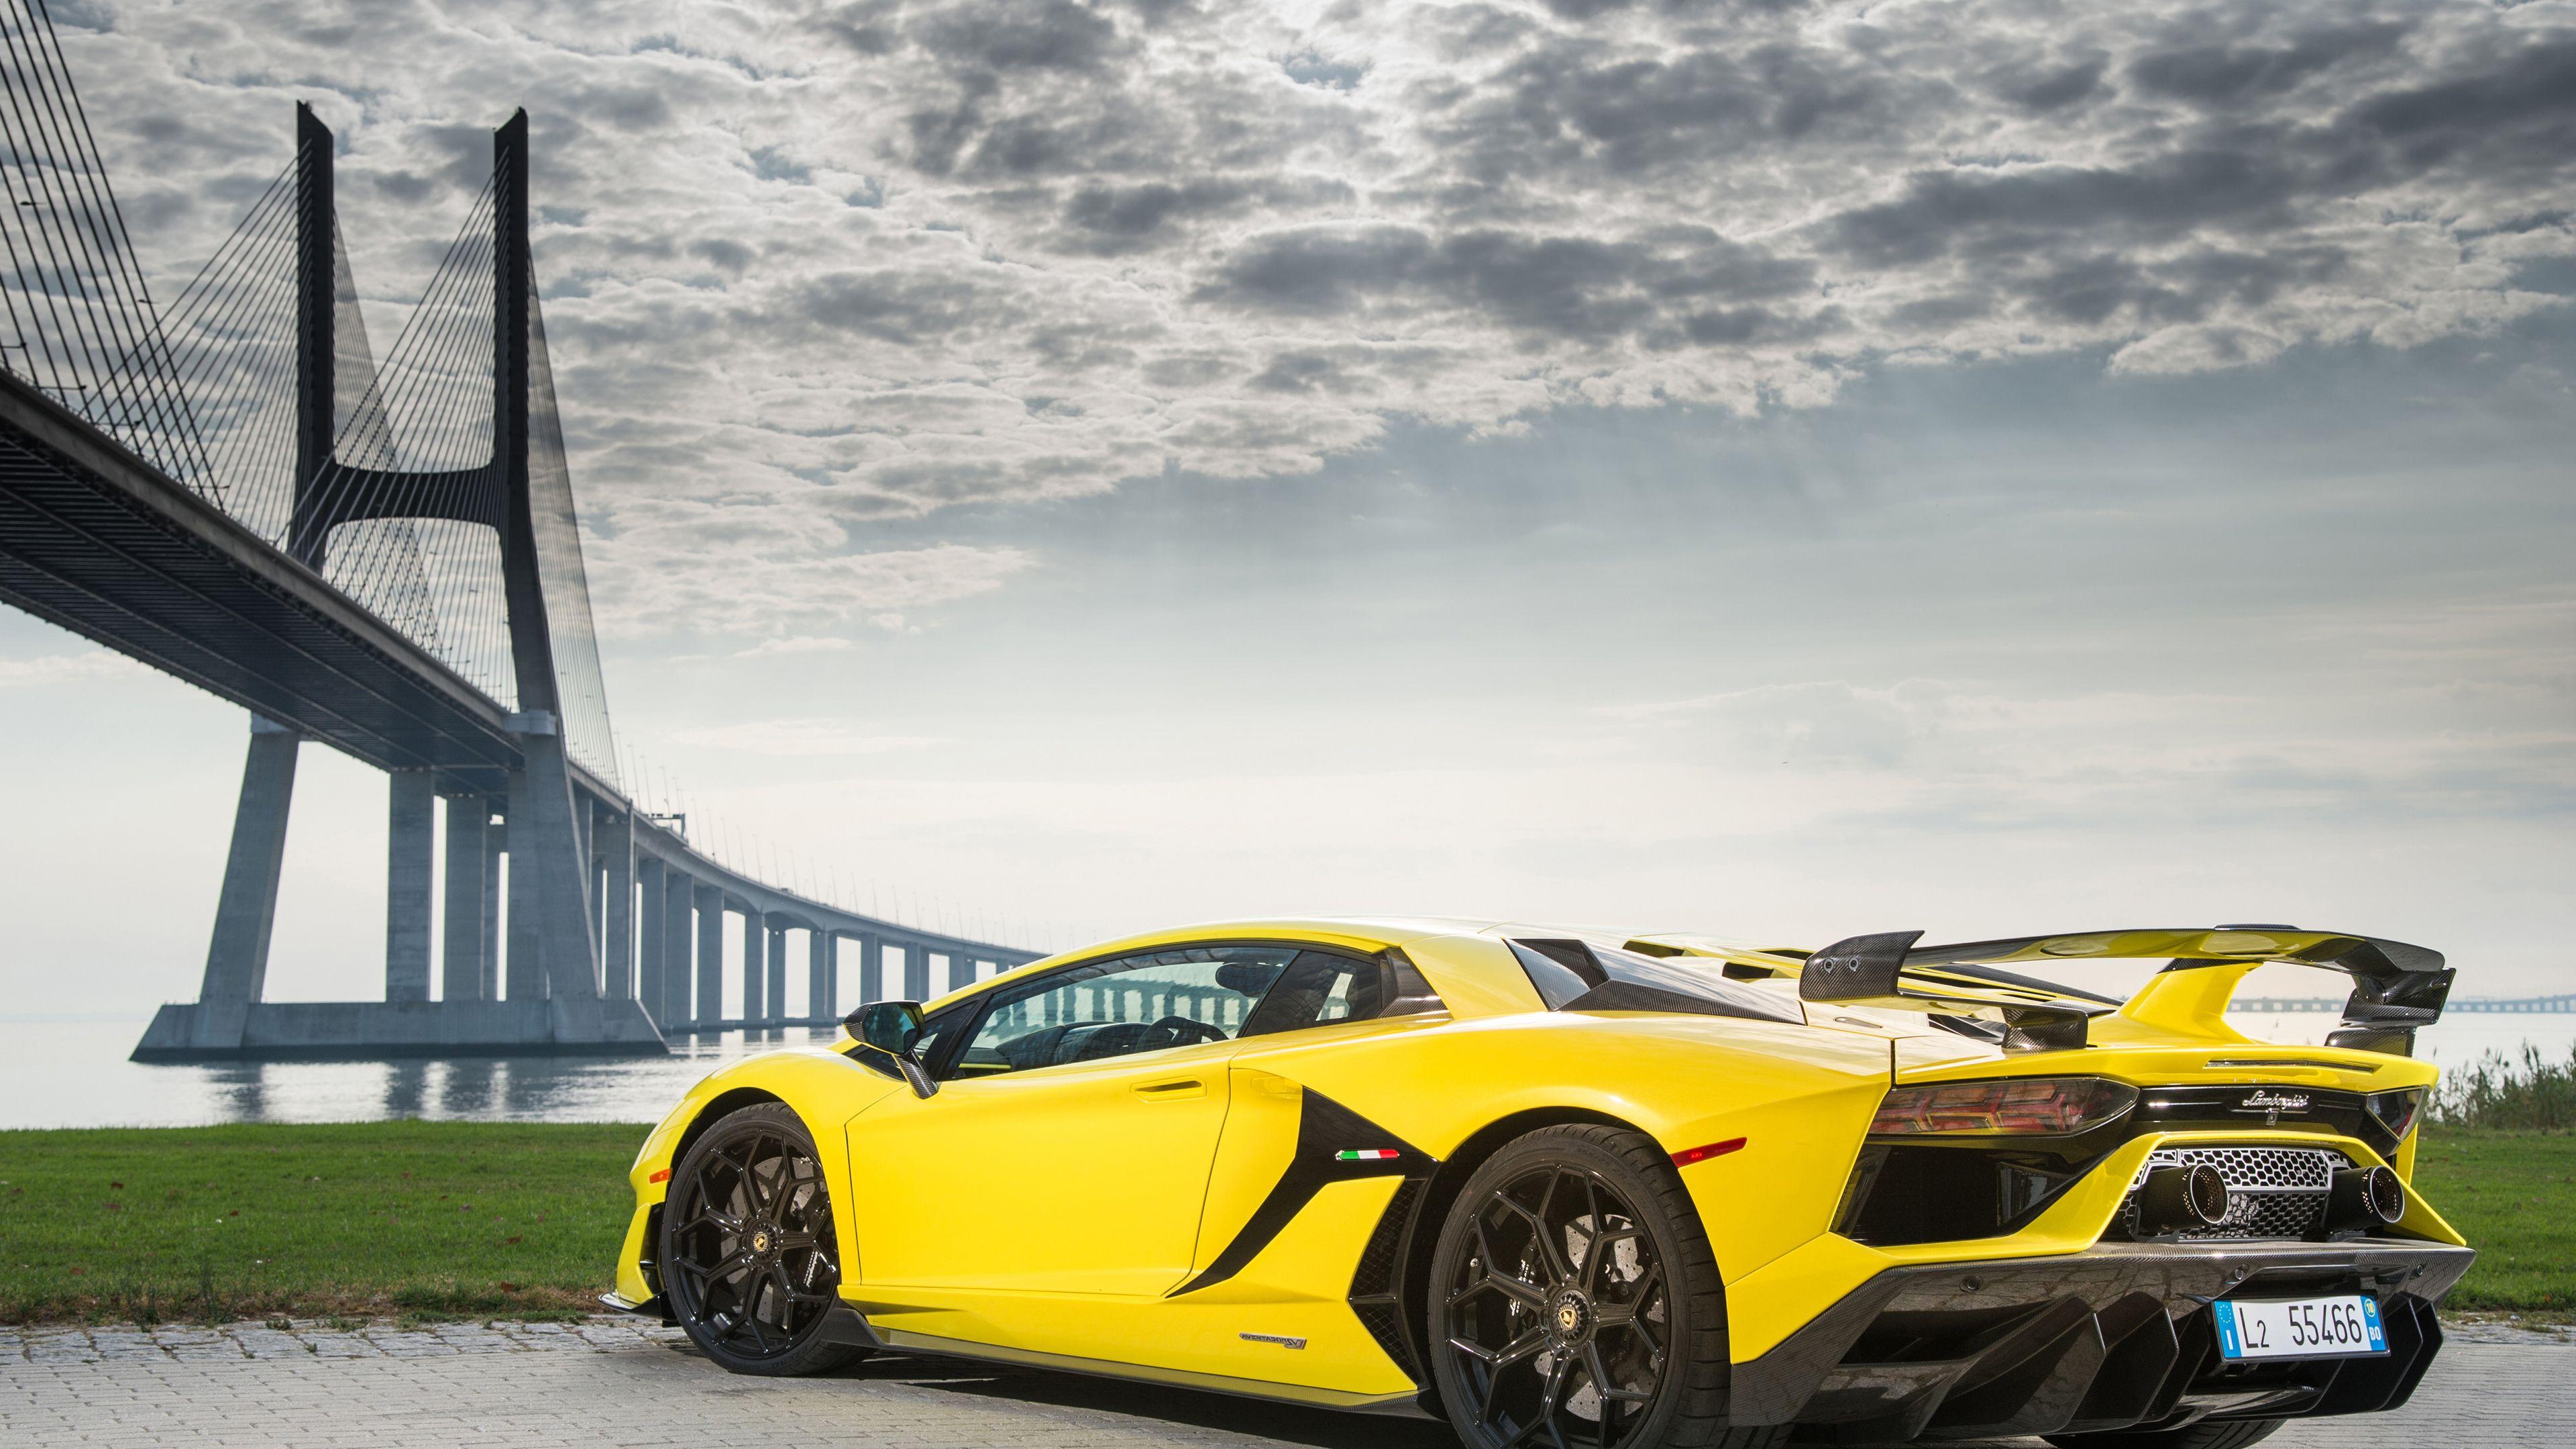 Wallpaper For Pc Of Lamborghini